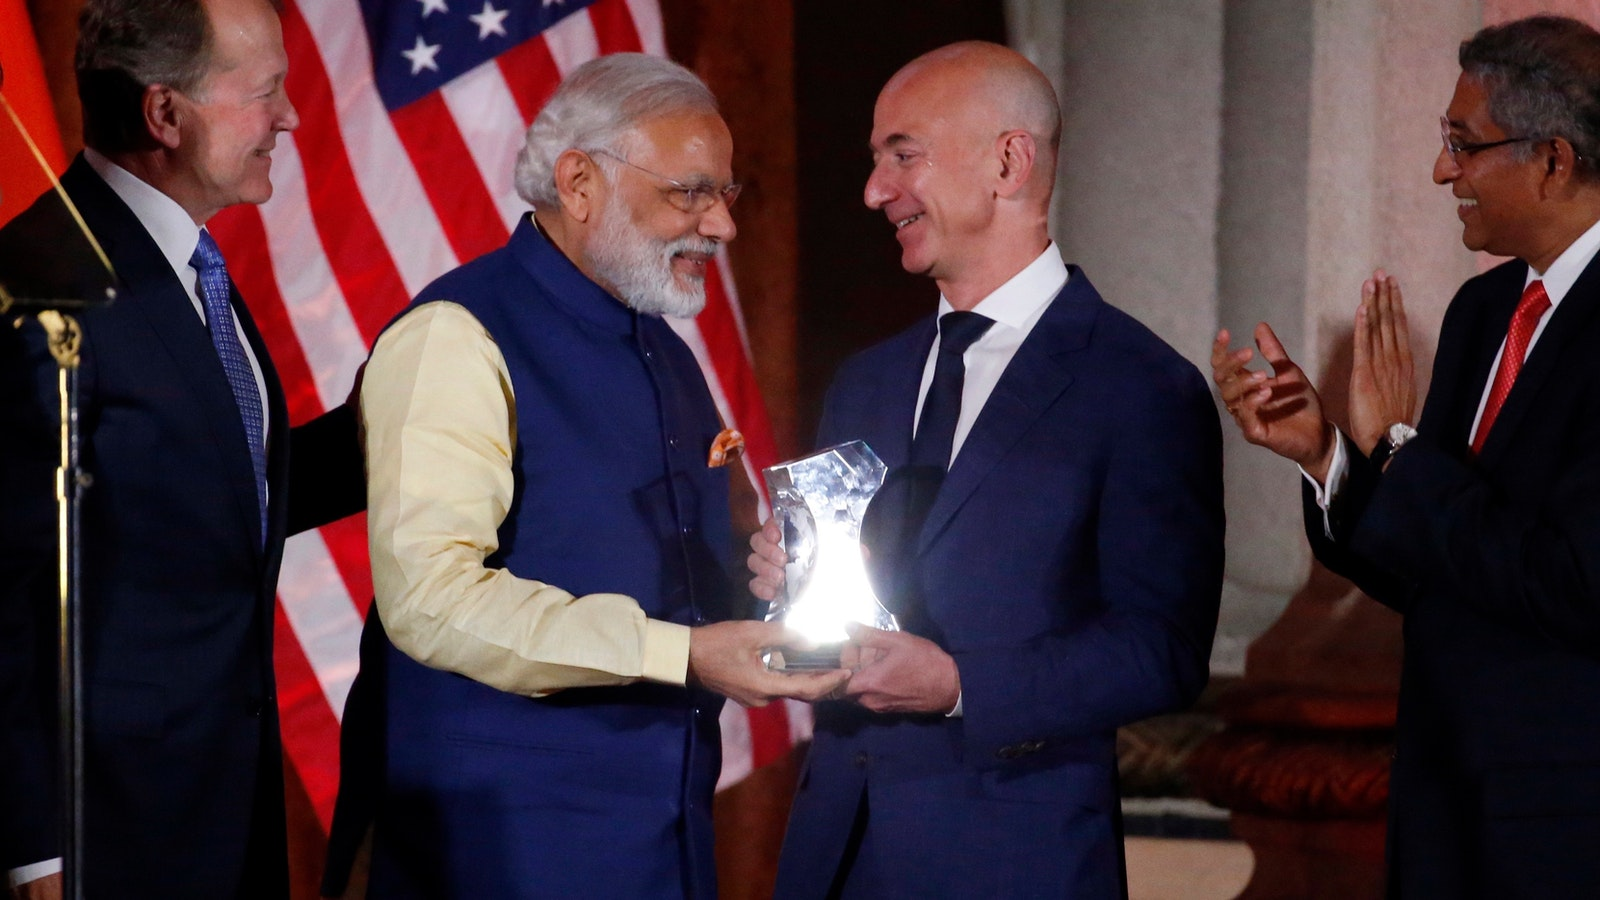 Indian Prime Minister Narendra Modi presenting an award to Amazon CEO Jeff Bezos in Washington on Tuesday. Photo by AP.